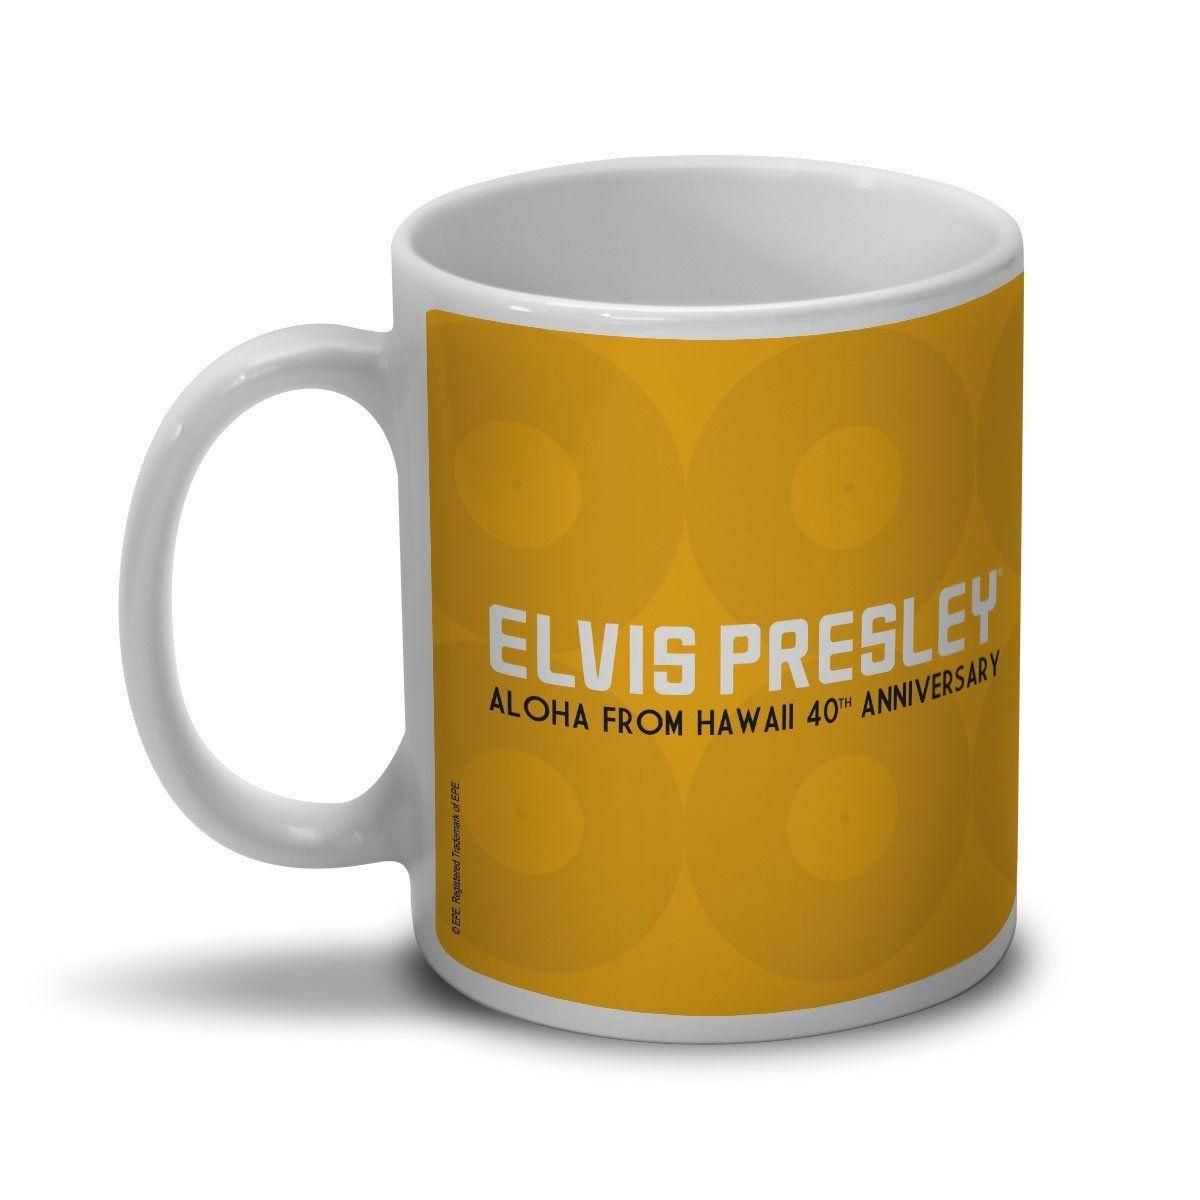 Caneca Elvis Aloha From Hawaii 40th Anniversary  - bandUP Store Marketplace